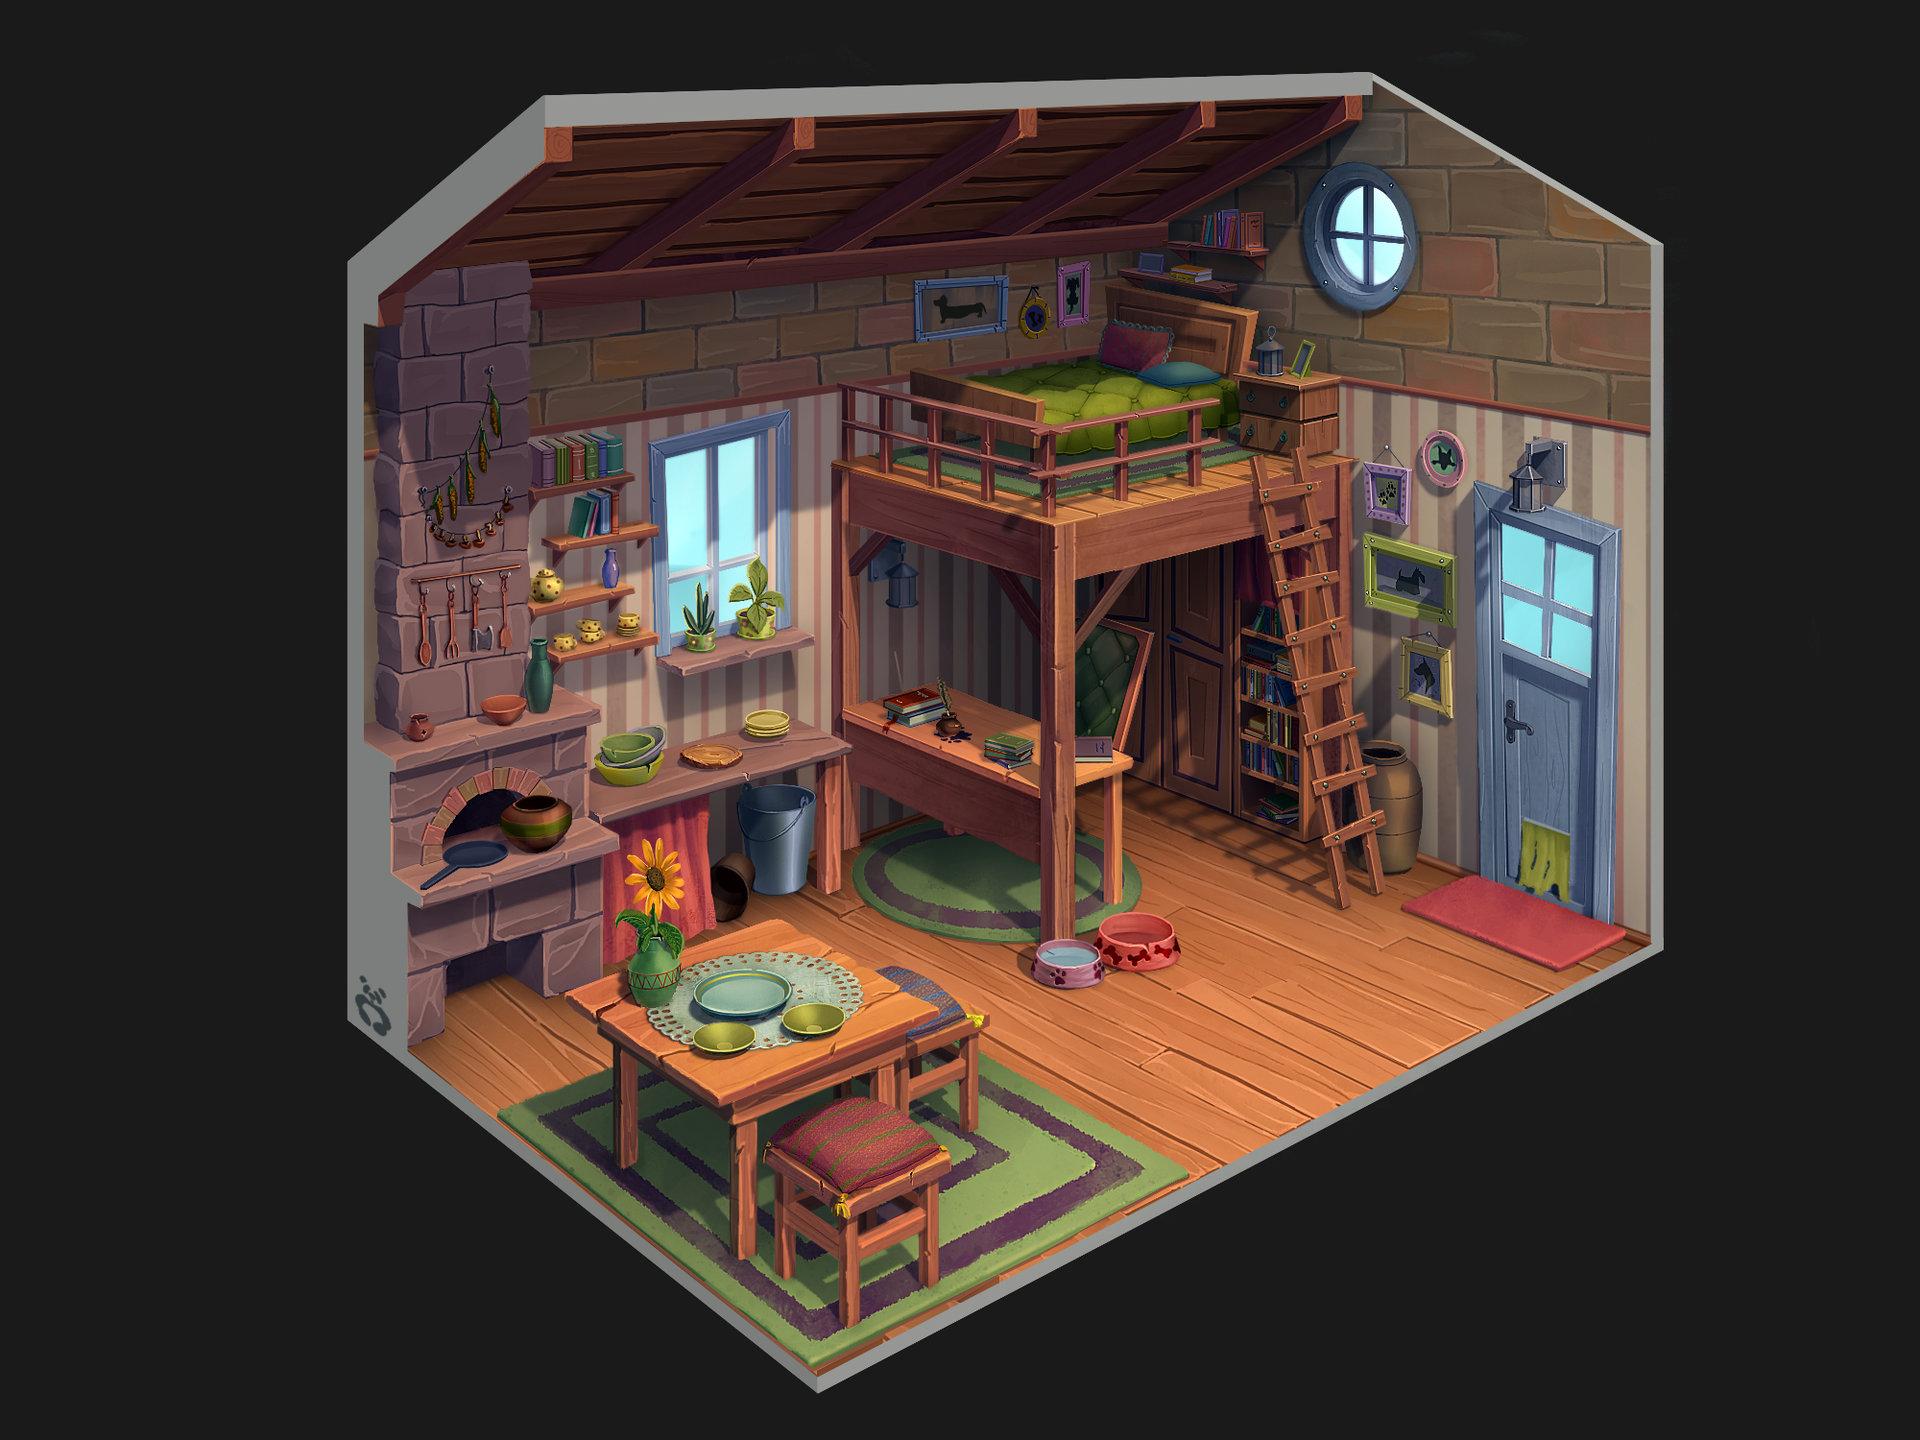 Yana blyzniuk house interior final